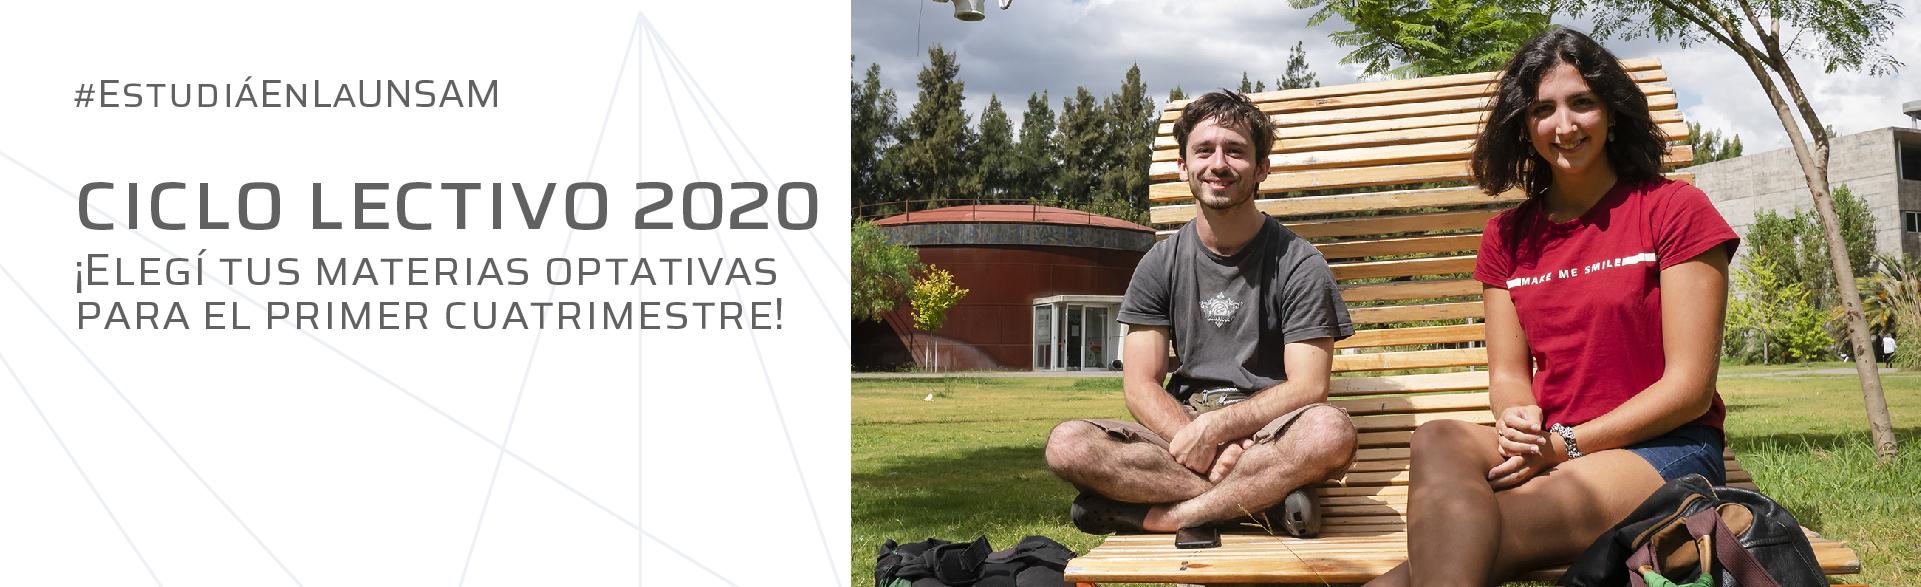 Materias optativas 2020